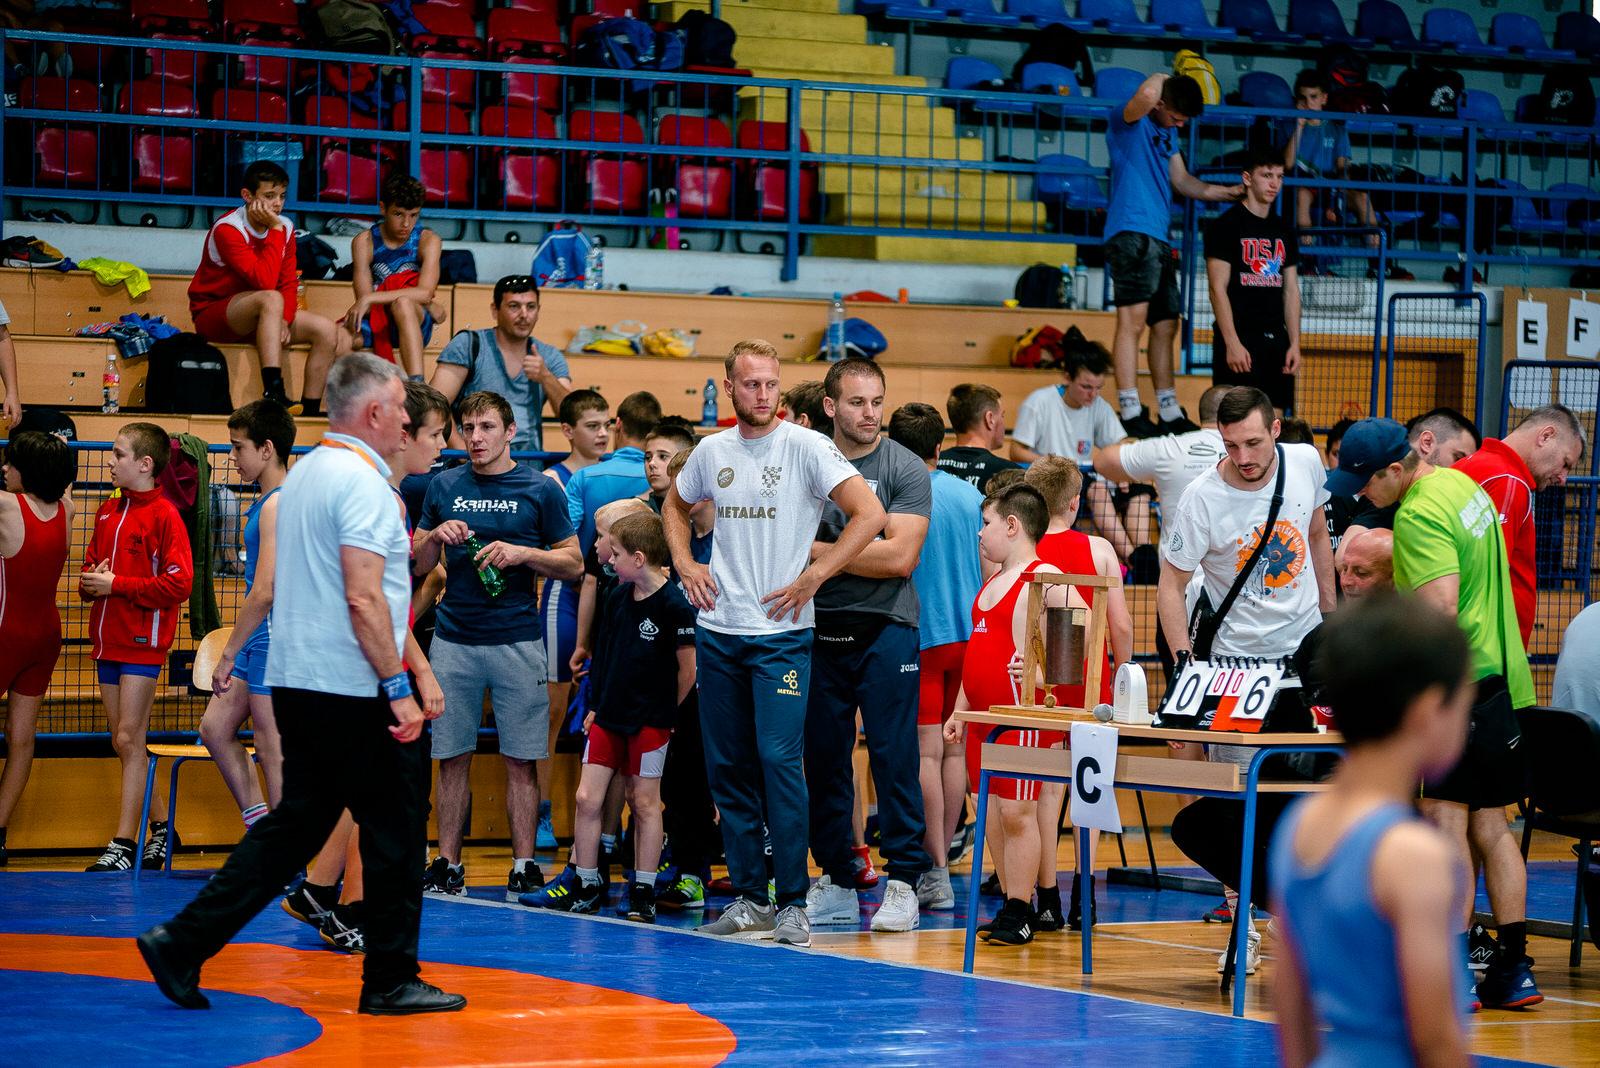 likaclub_gospić-open-hrvanje_2019-67